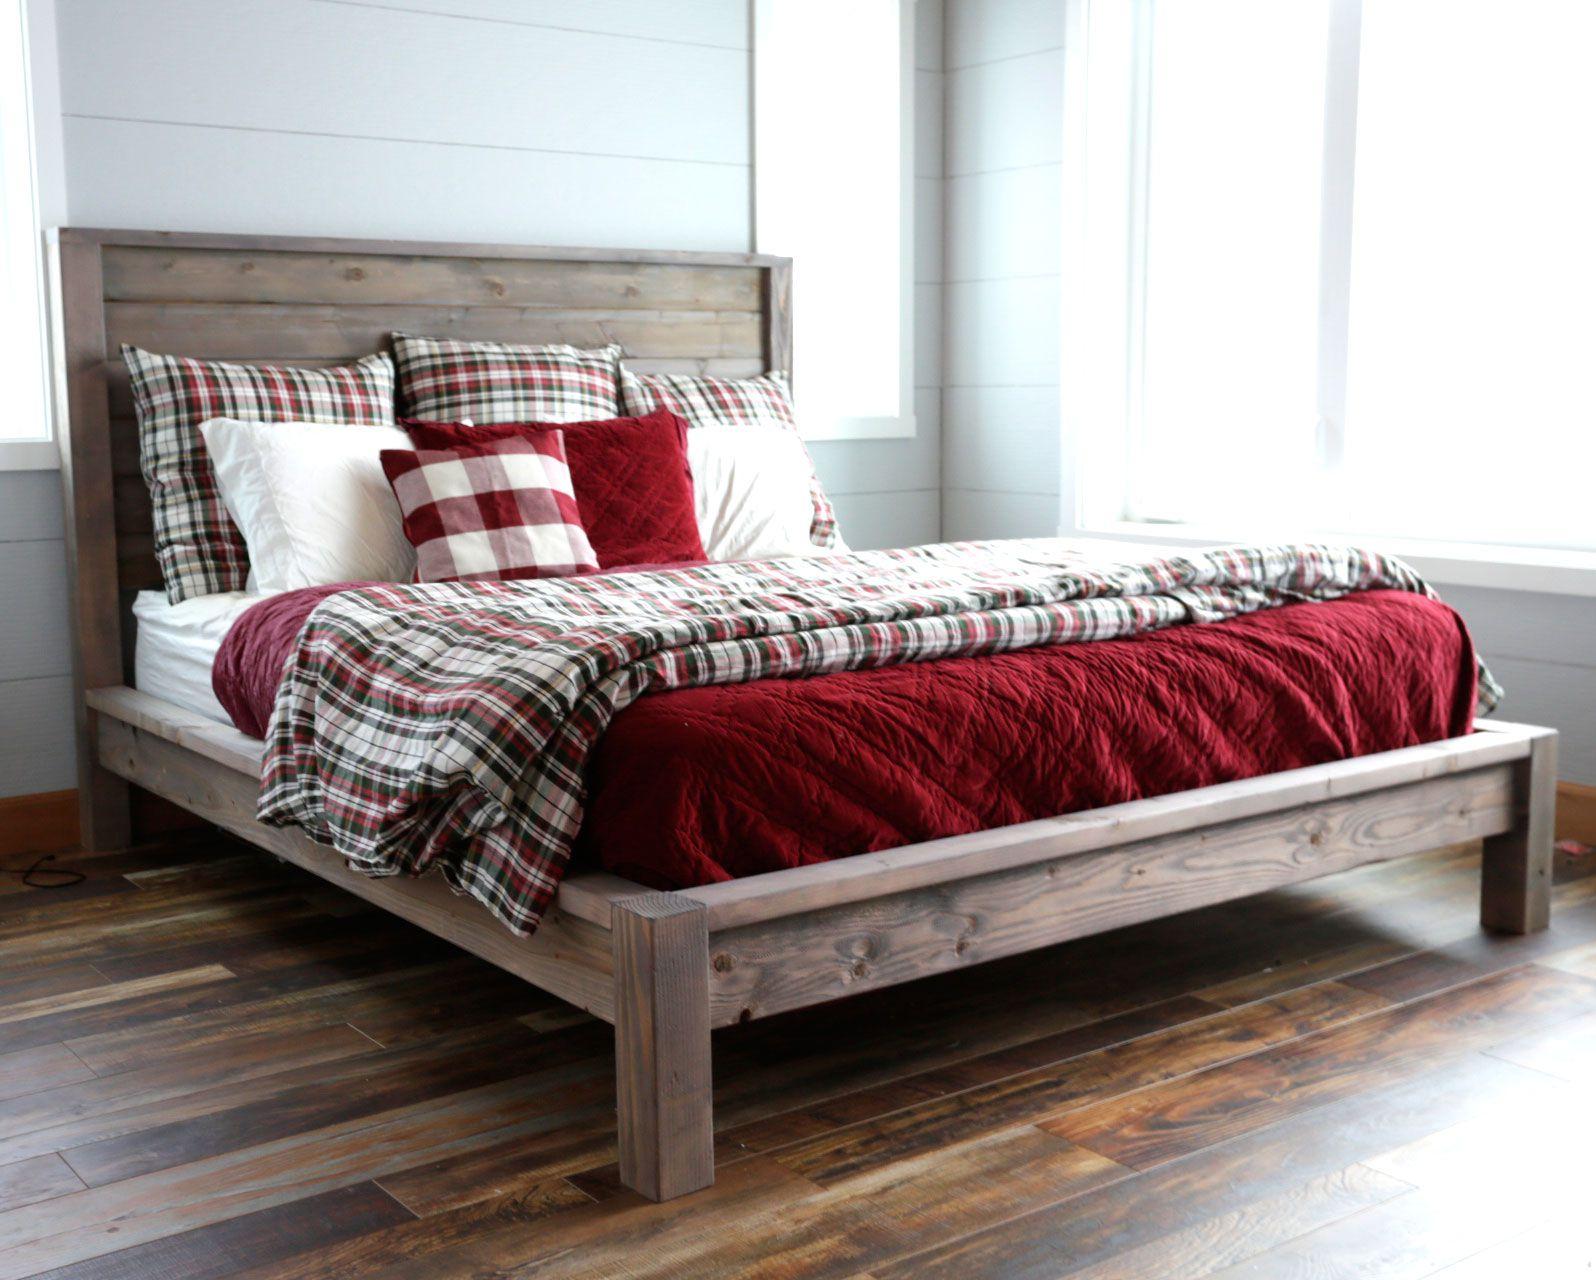 Modern Farmhouse Bed Frame Farmhouse Bedroom Furniture